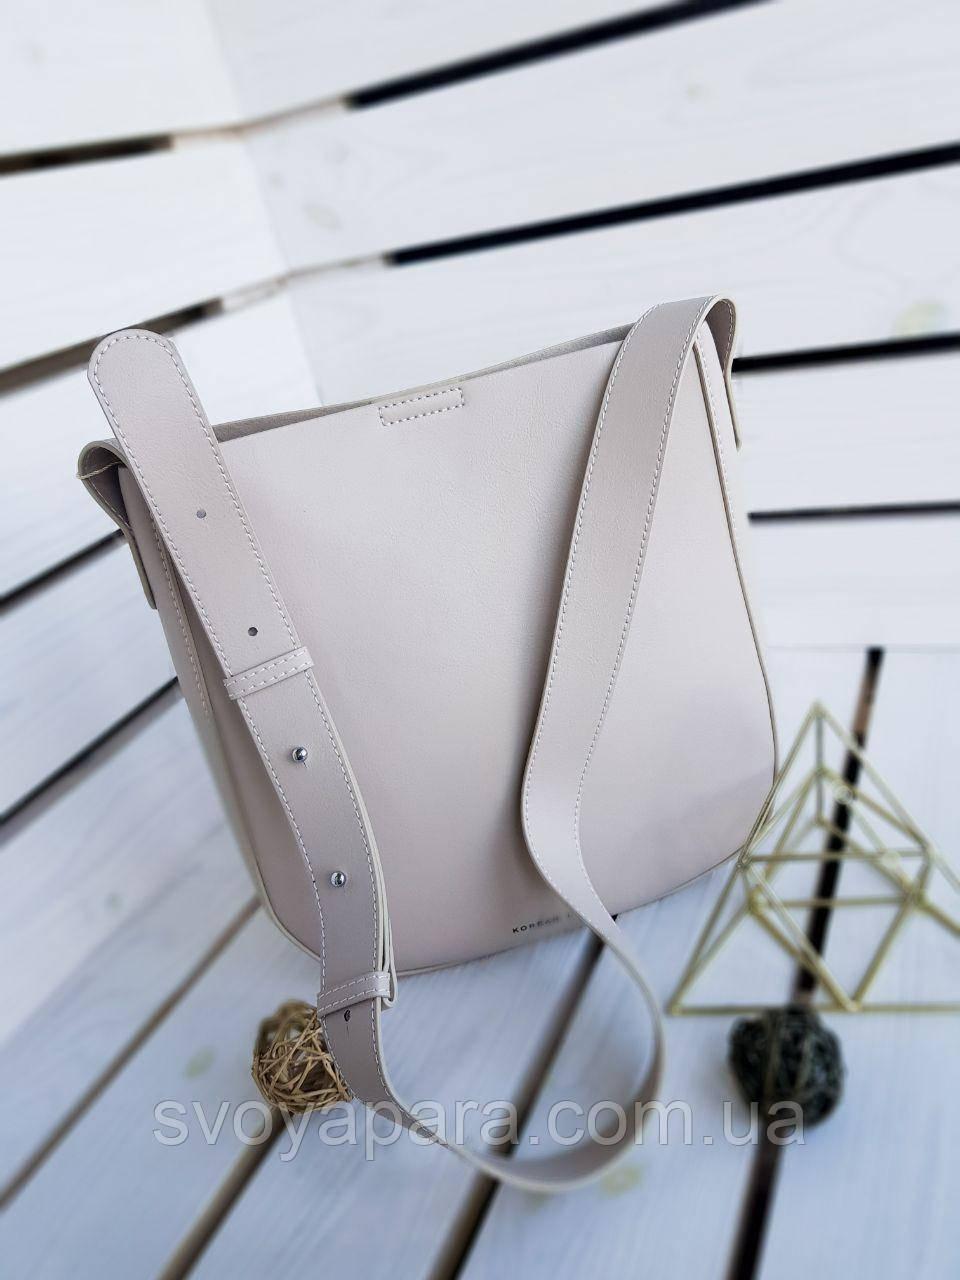 Кожаная женская сумка размером 25х18х12 см Бежевая (01150)